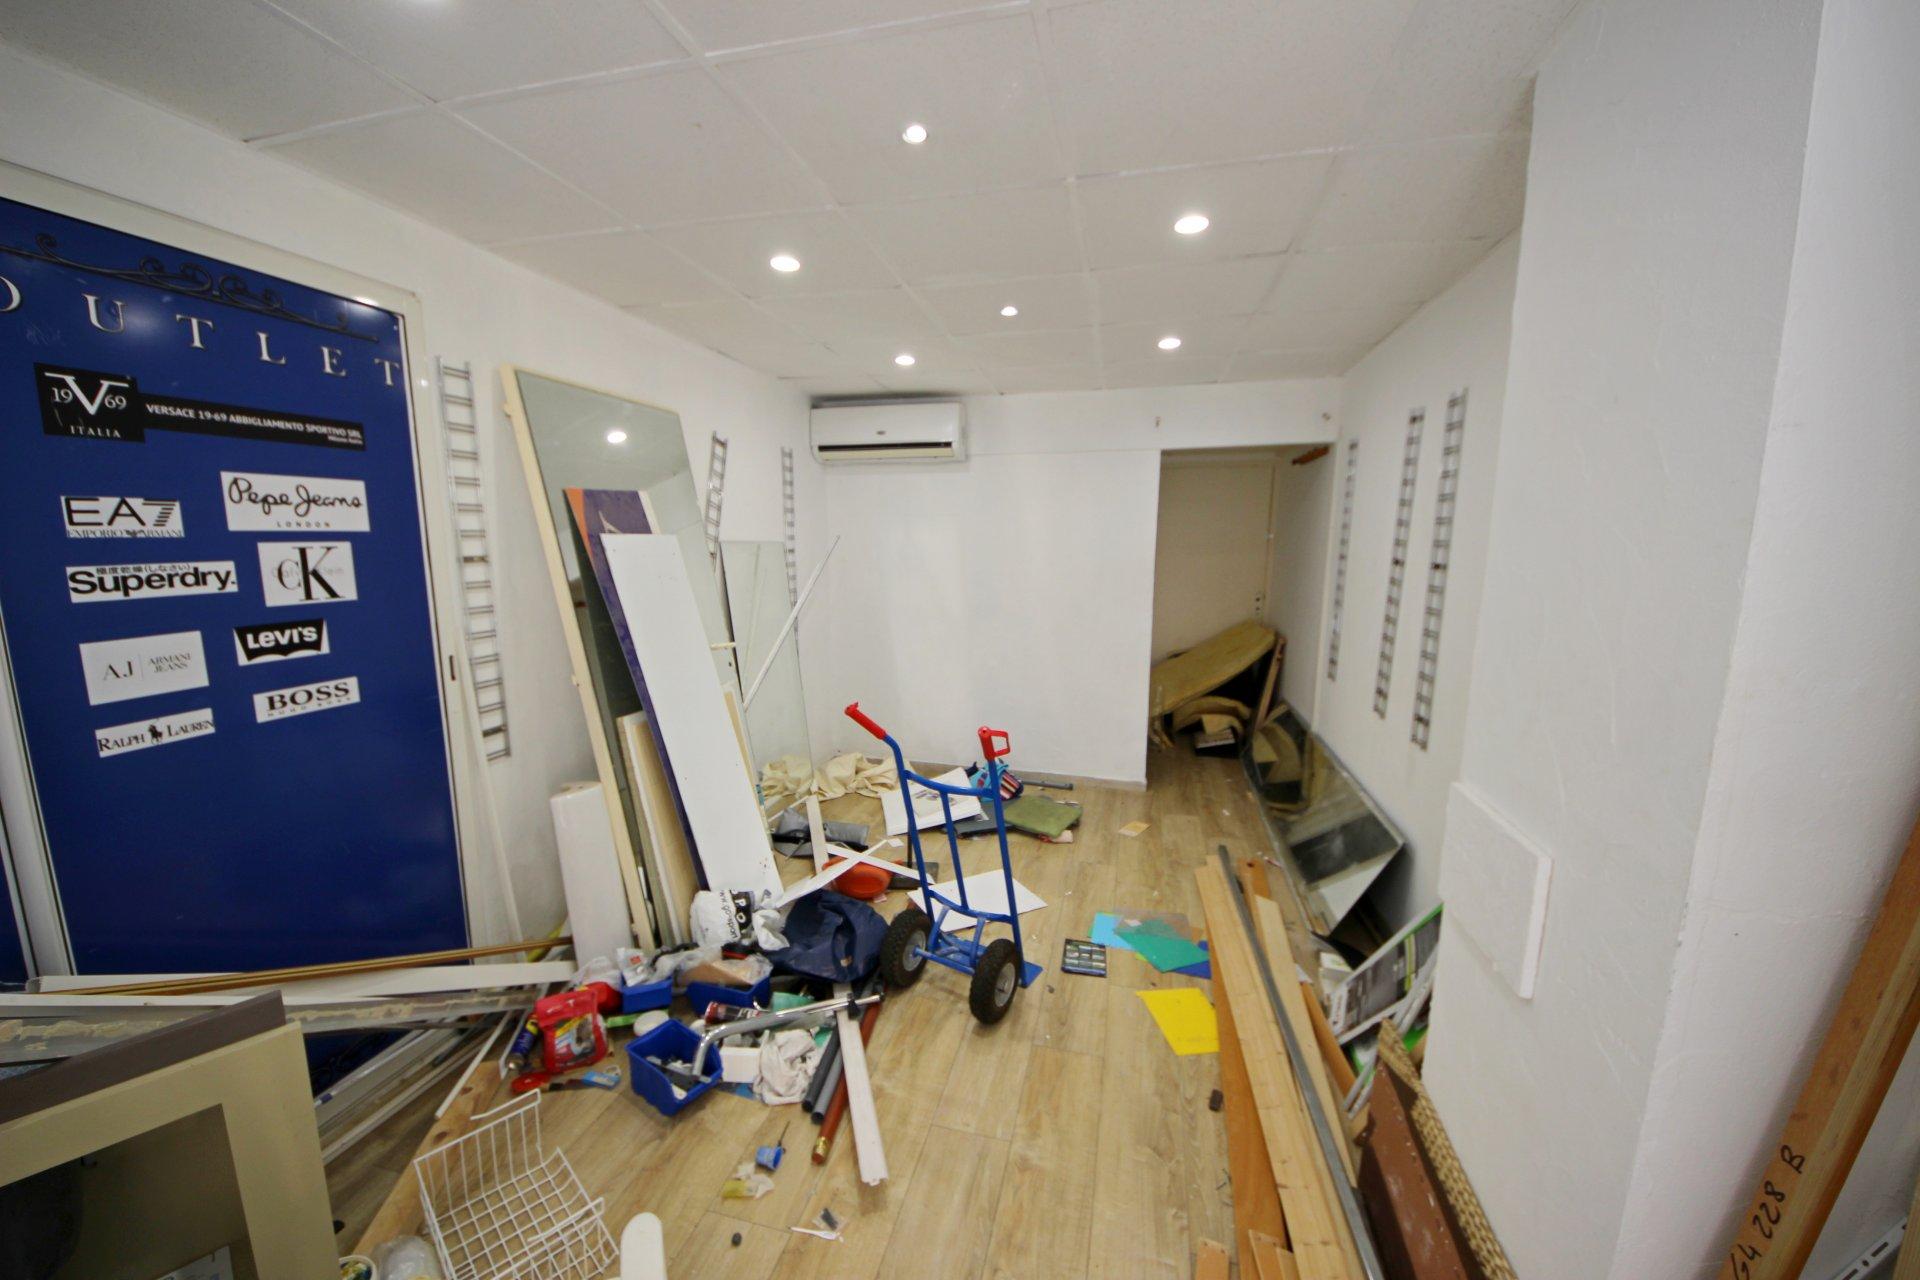 PremisesStage Ground floor, General condition Good, Window OUICompanyActivitiesAuthorised TOUTES ...